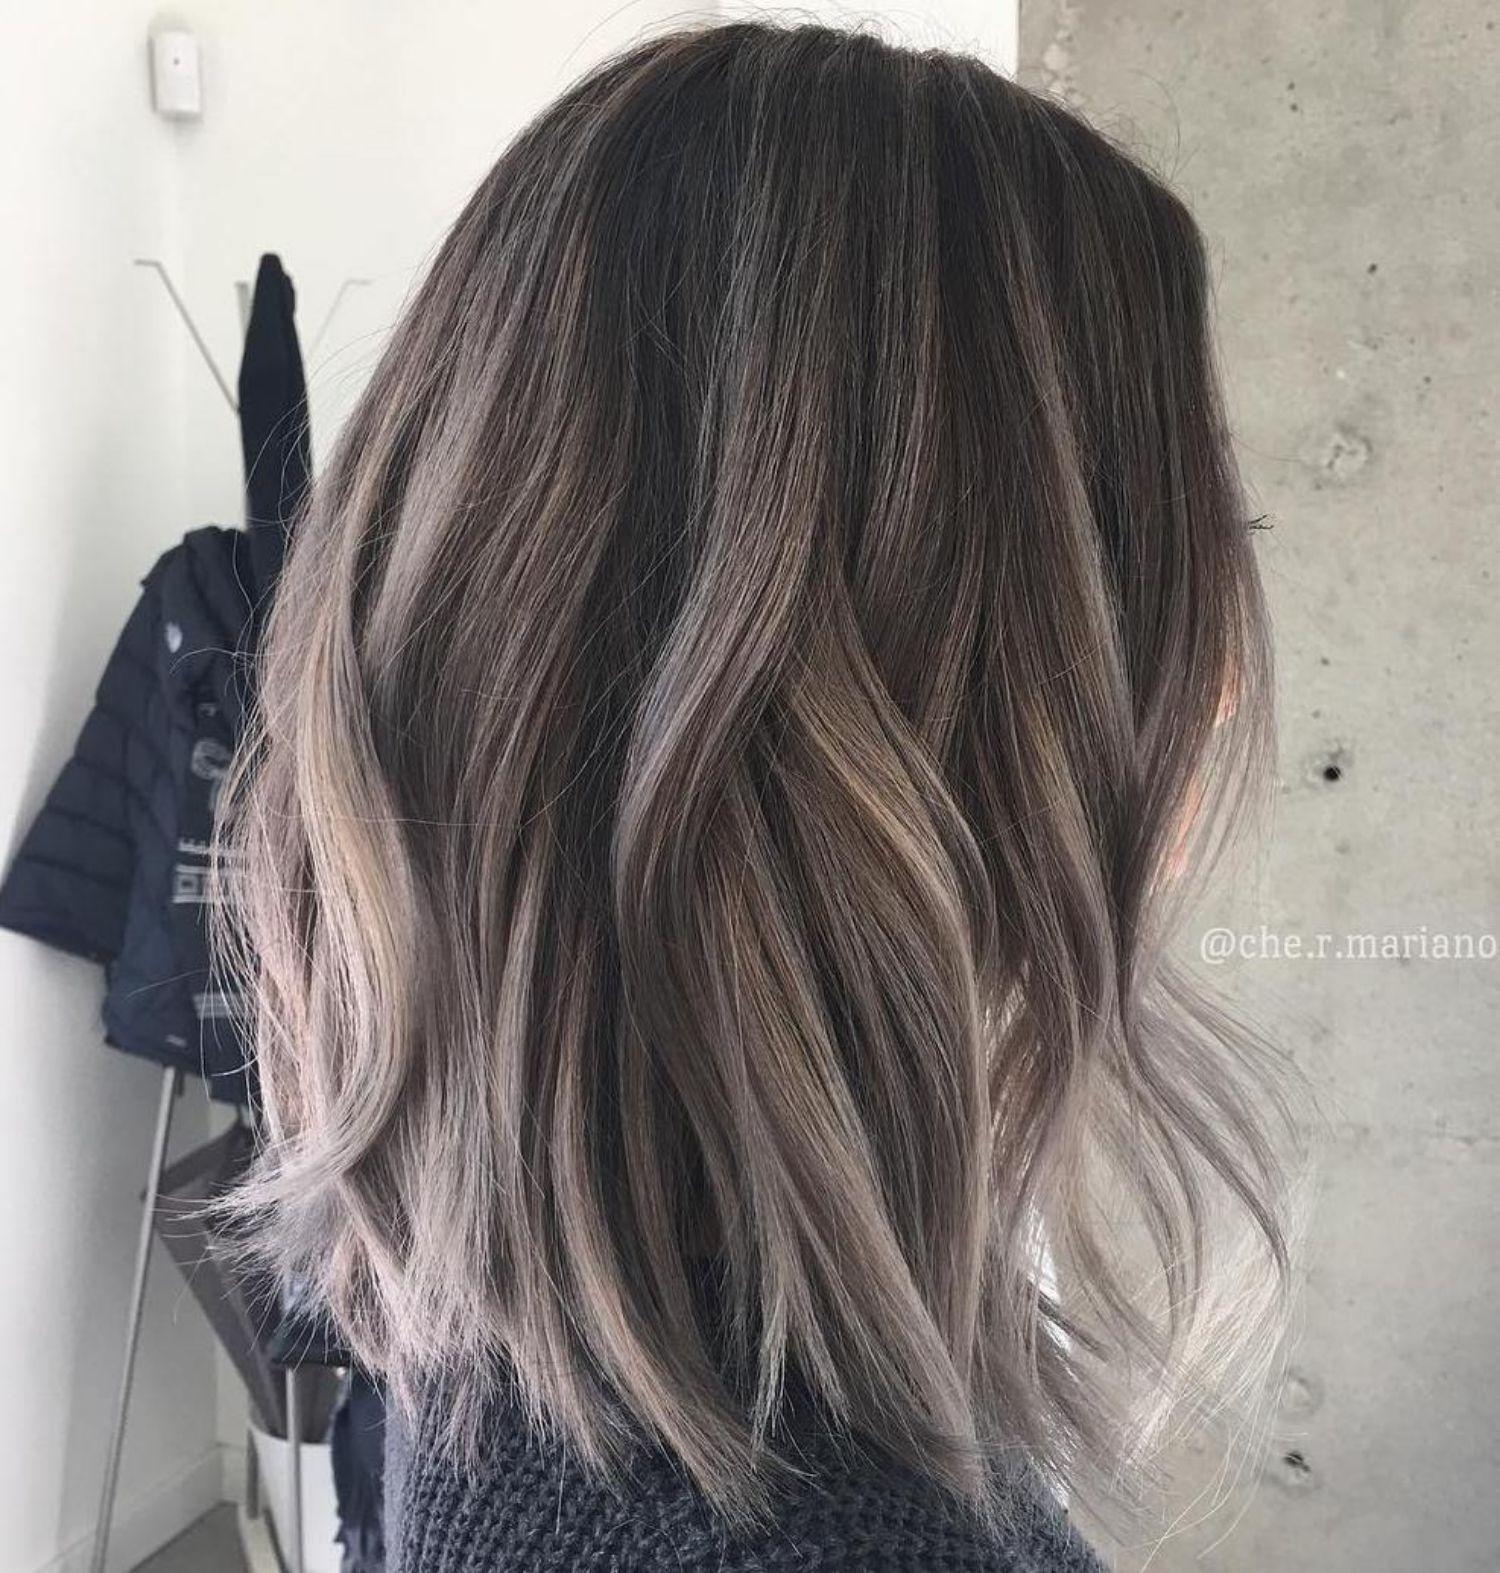 60 Shades Of Grey Silver And White Highlights For Eternal Youth Medium Length Hair Styles Hair Colour Design Medium Hair Color